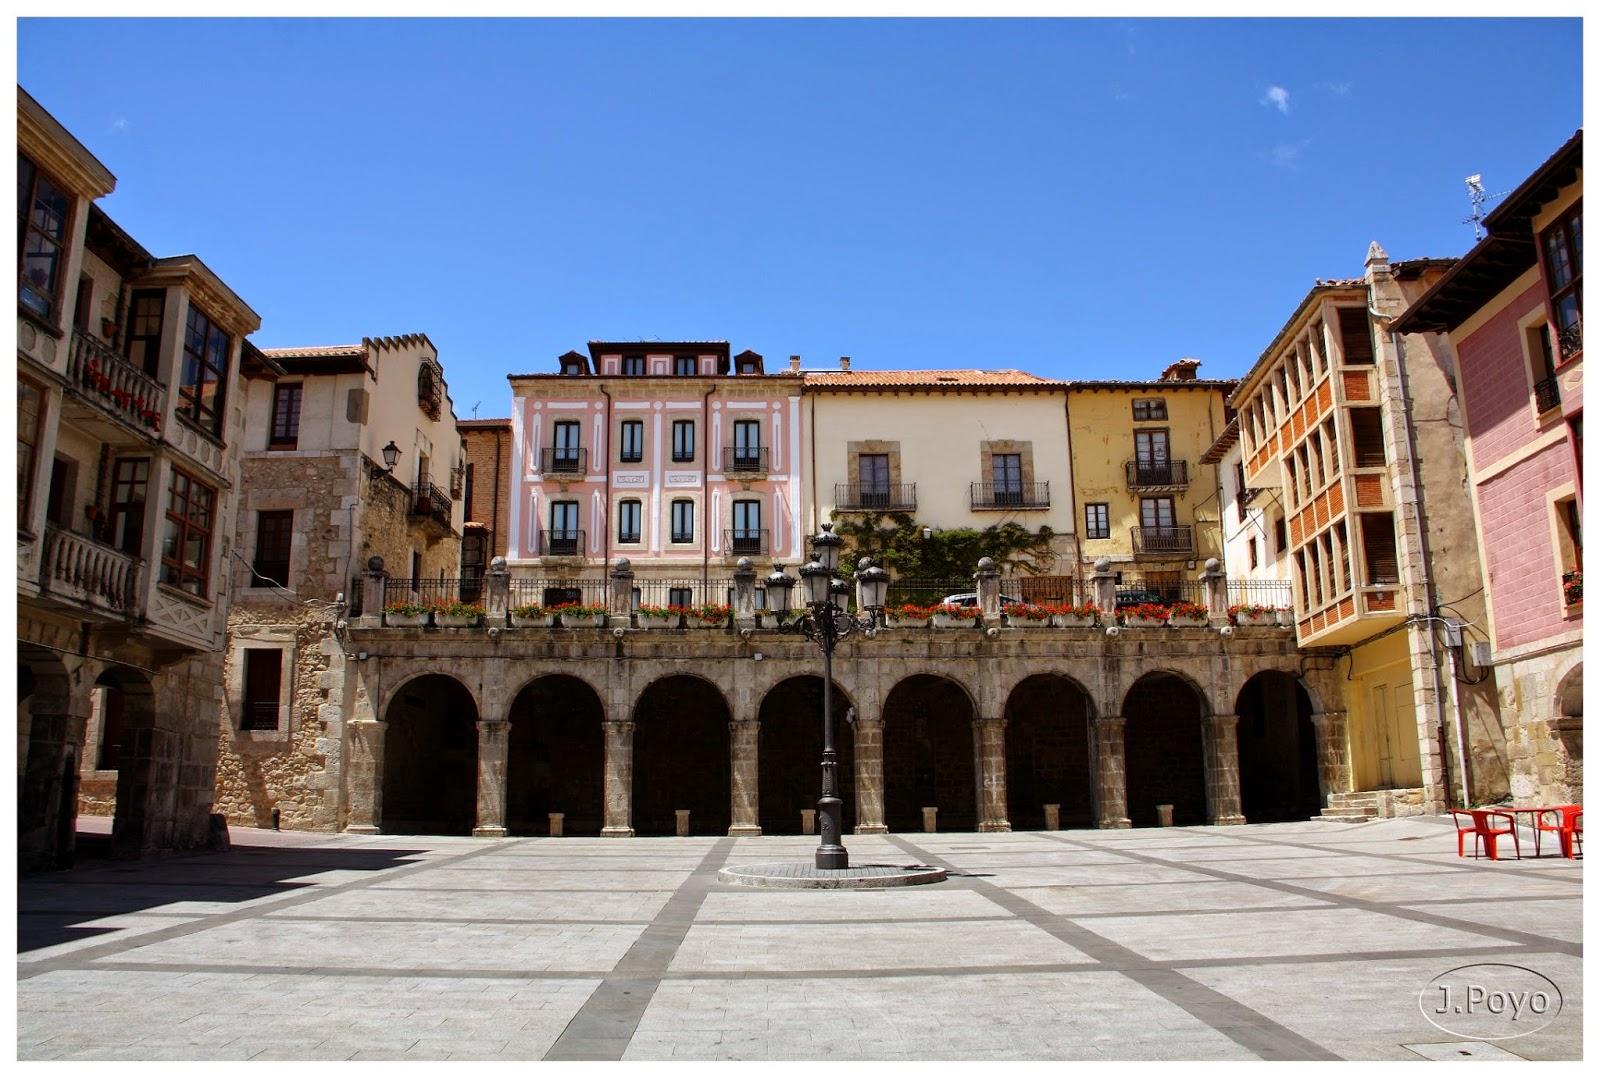 Medina de Pomar